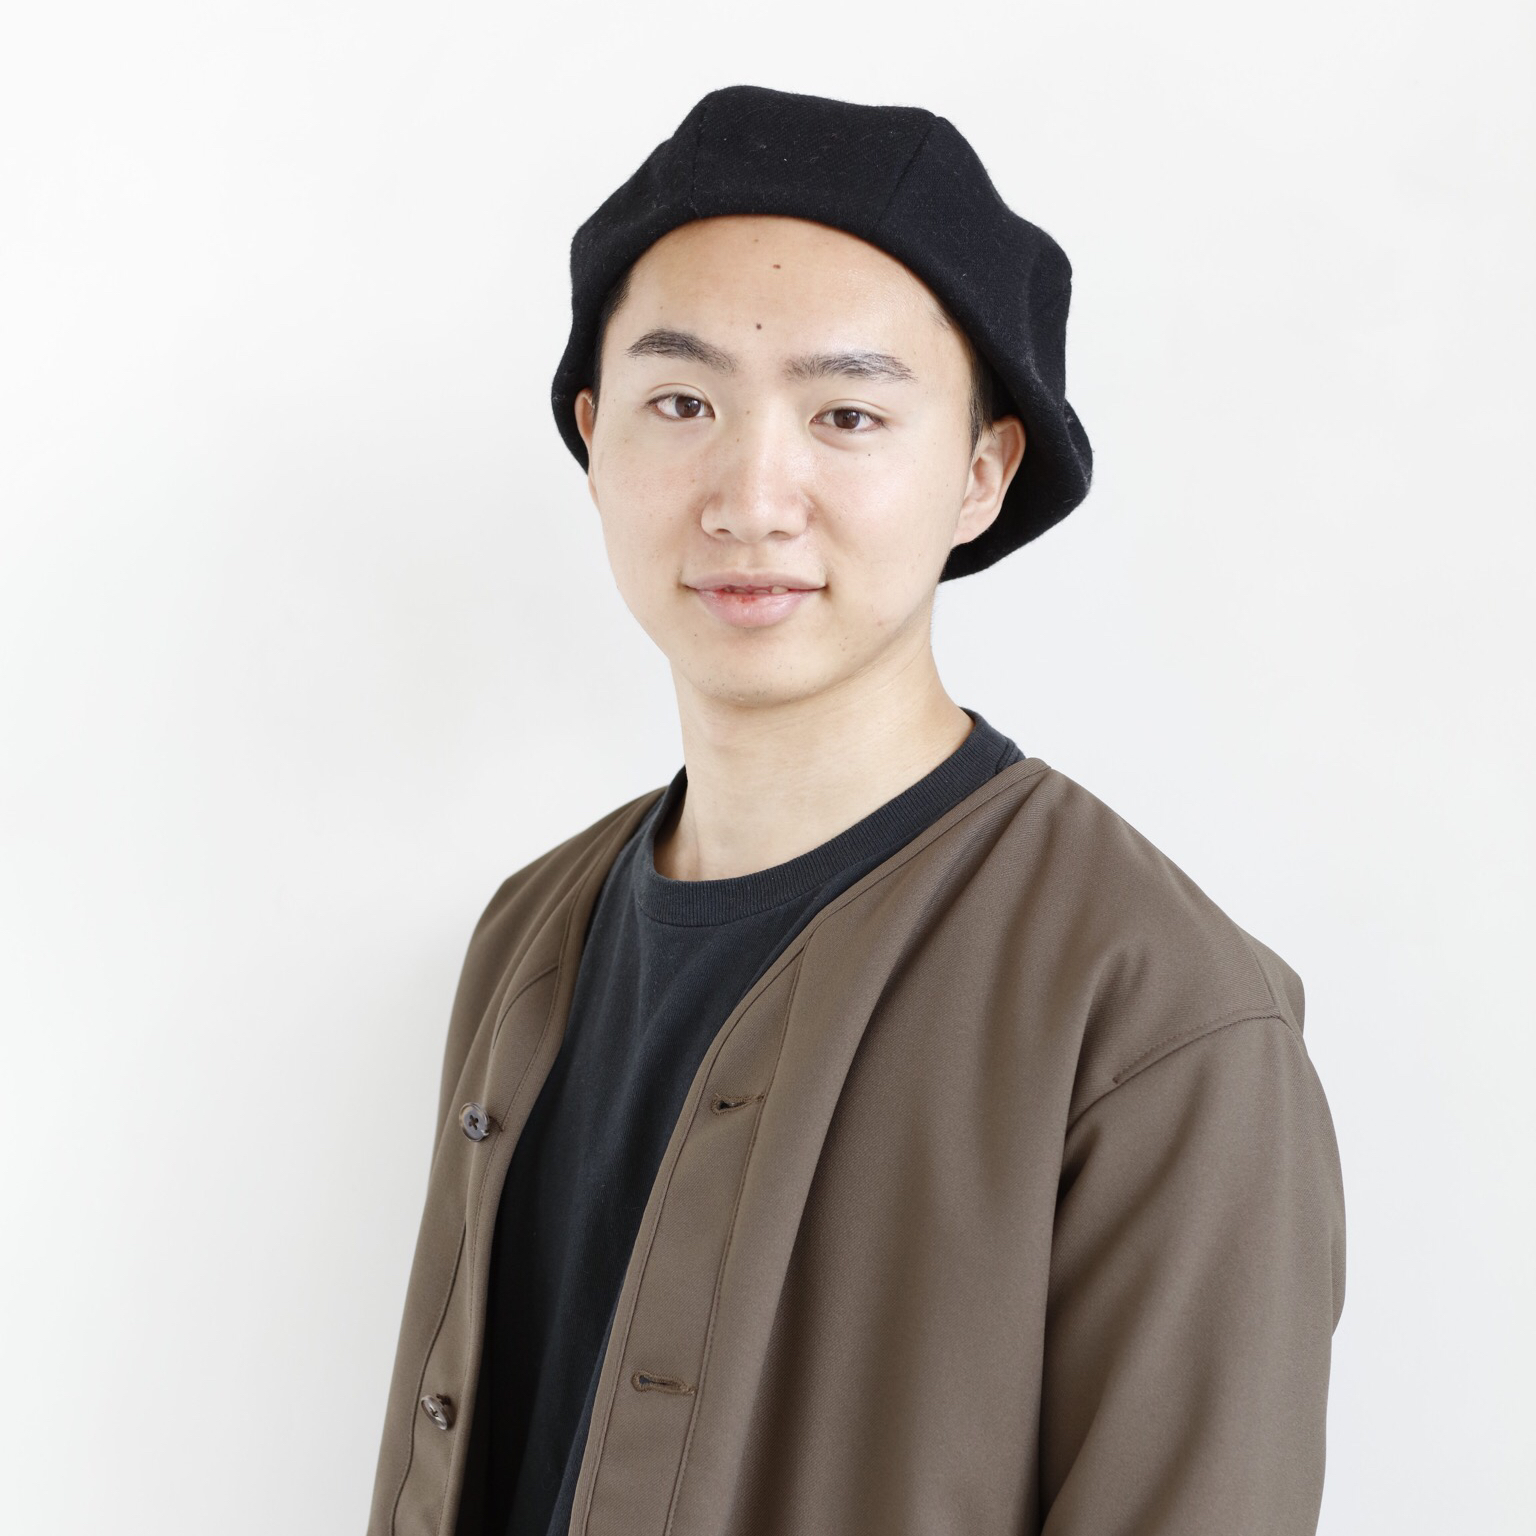 ZACC vie 遠井春彦